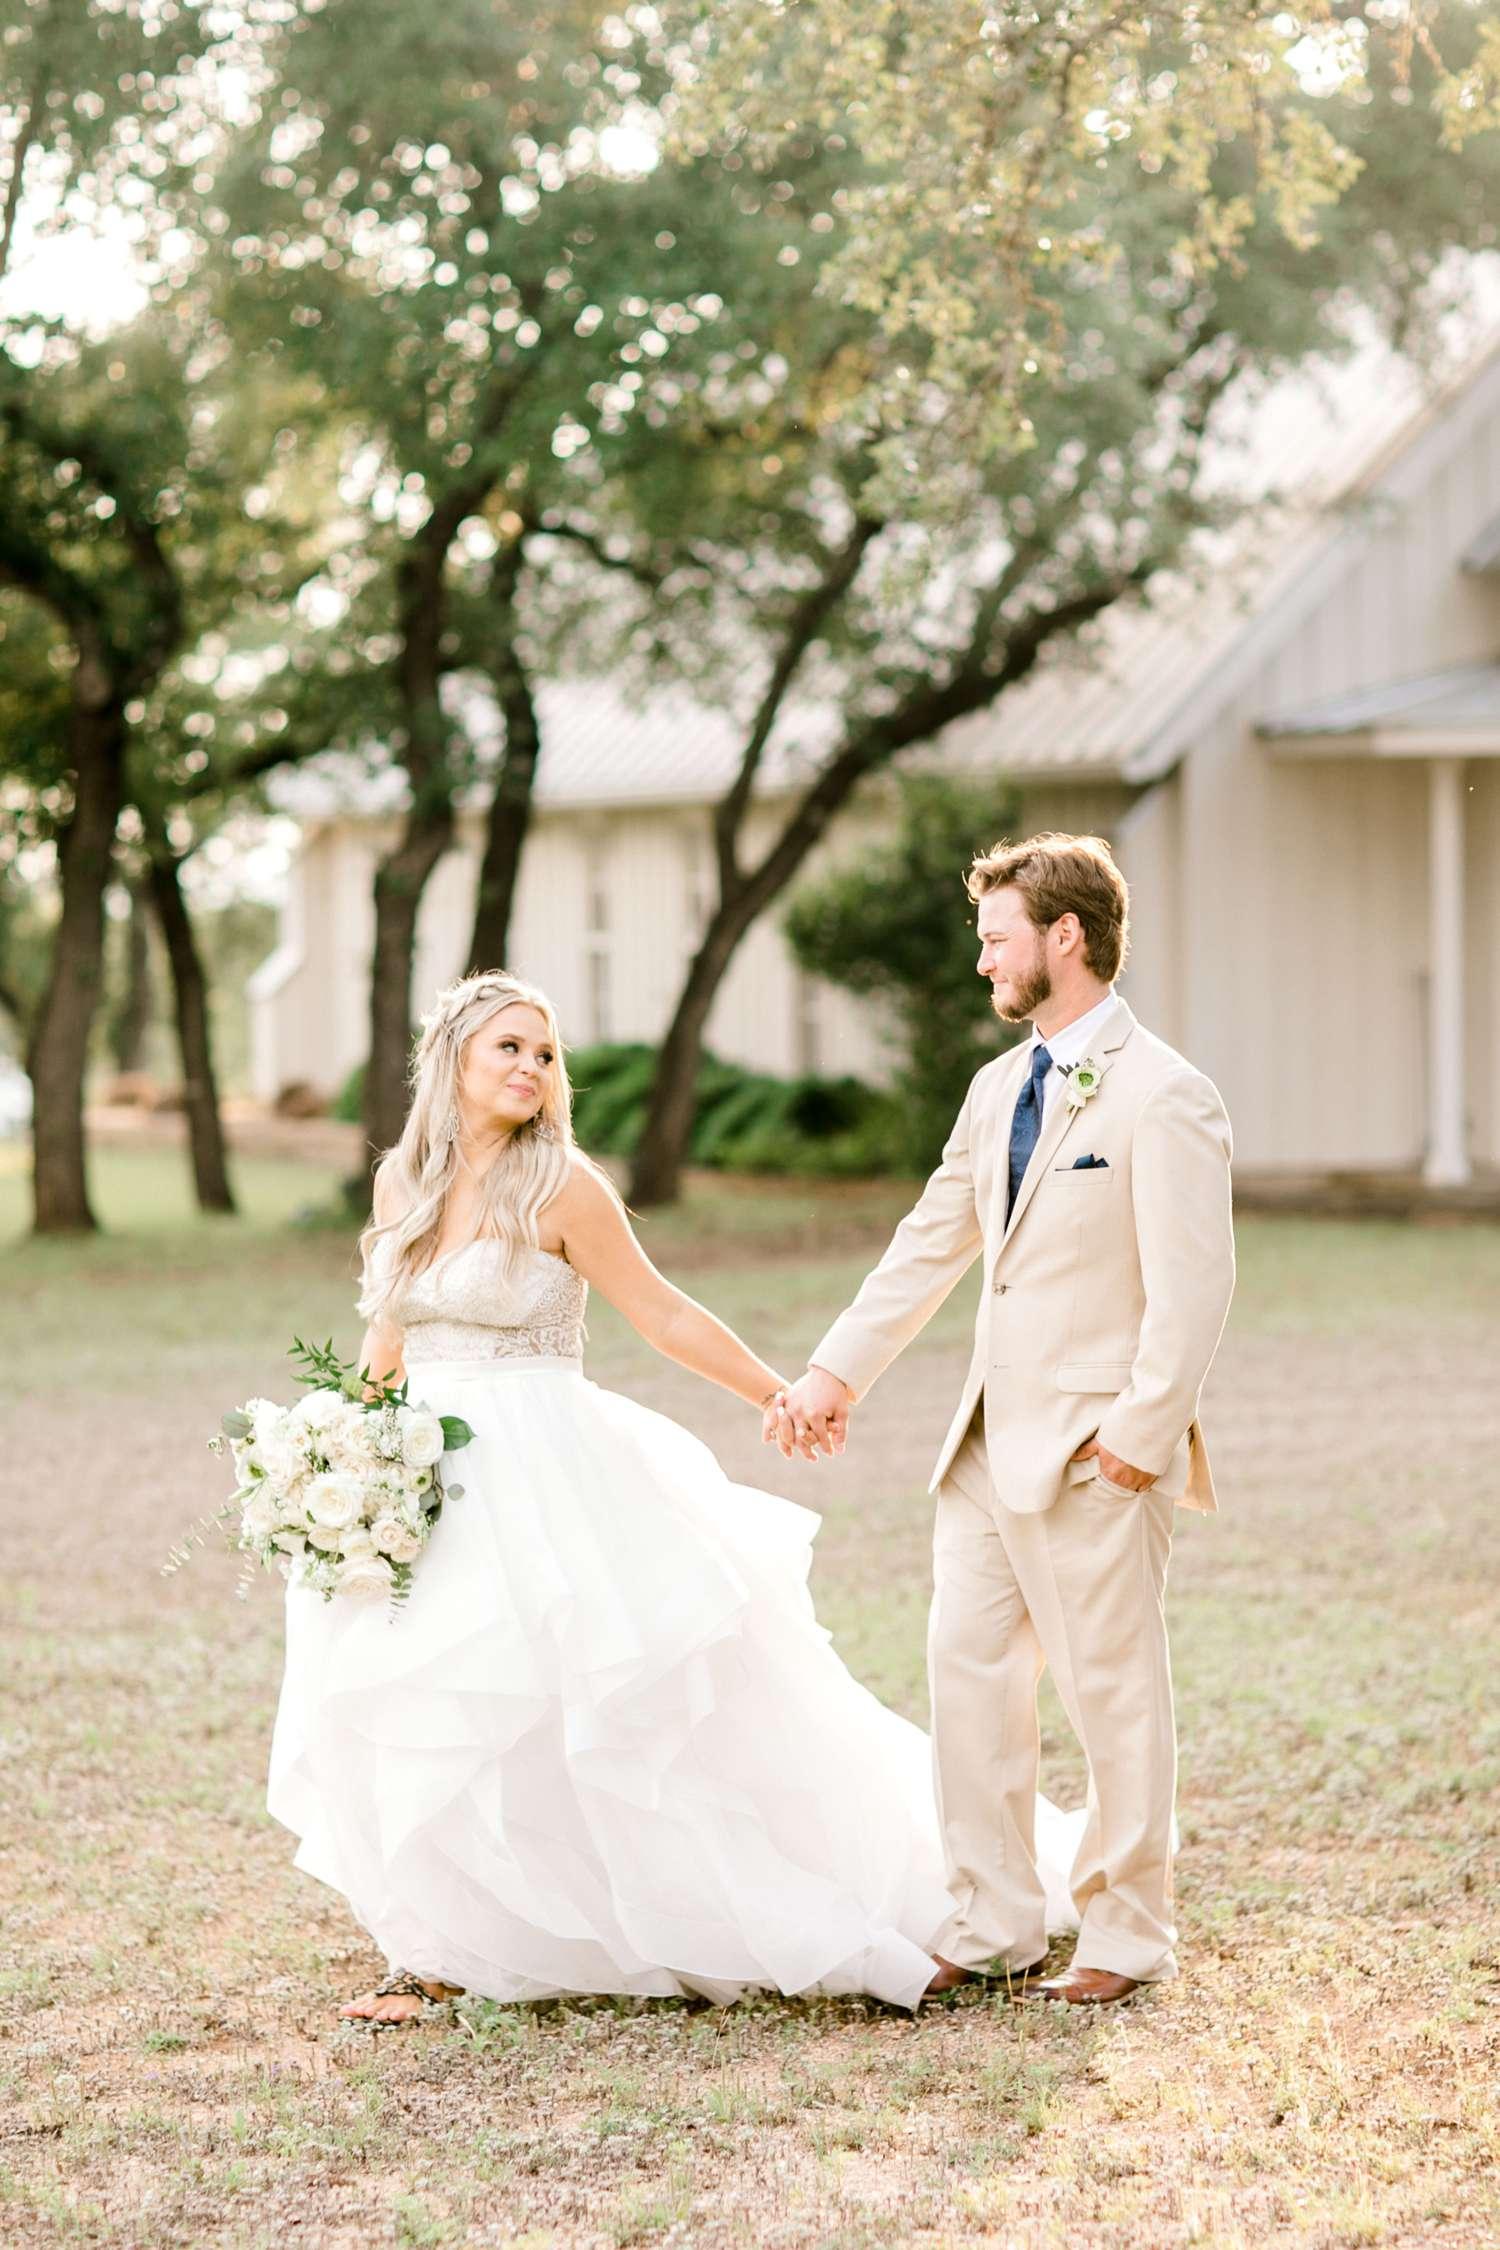 HAYLEE+JUSTIN+GREGORY+HERITAGE_HAUS_AUSTIN_TEXAS_WEDDING_0104.jpg